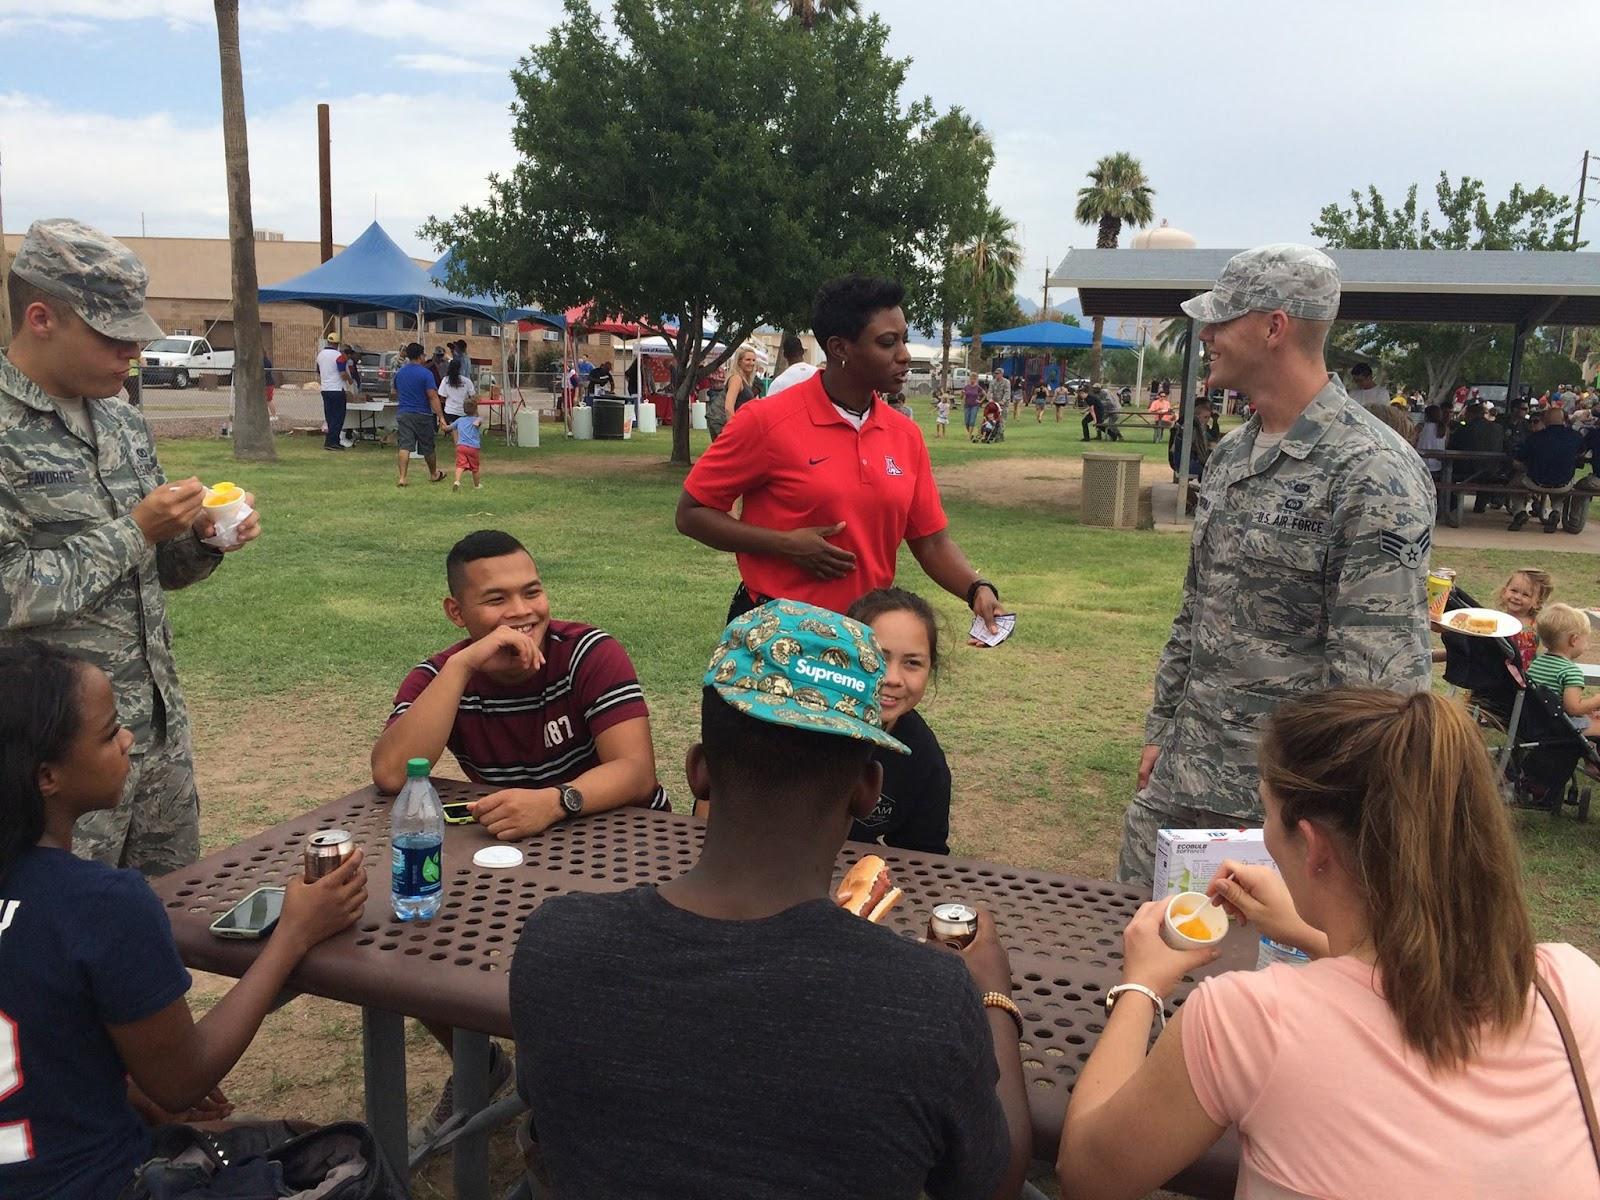 Tucson Thanks our Airmen and Families - 10357804_890713477669433_3784008613843830893_o.jpg